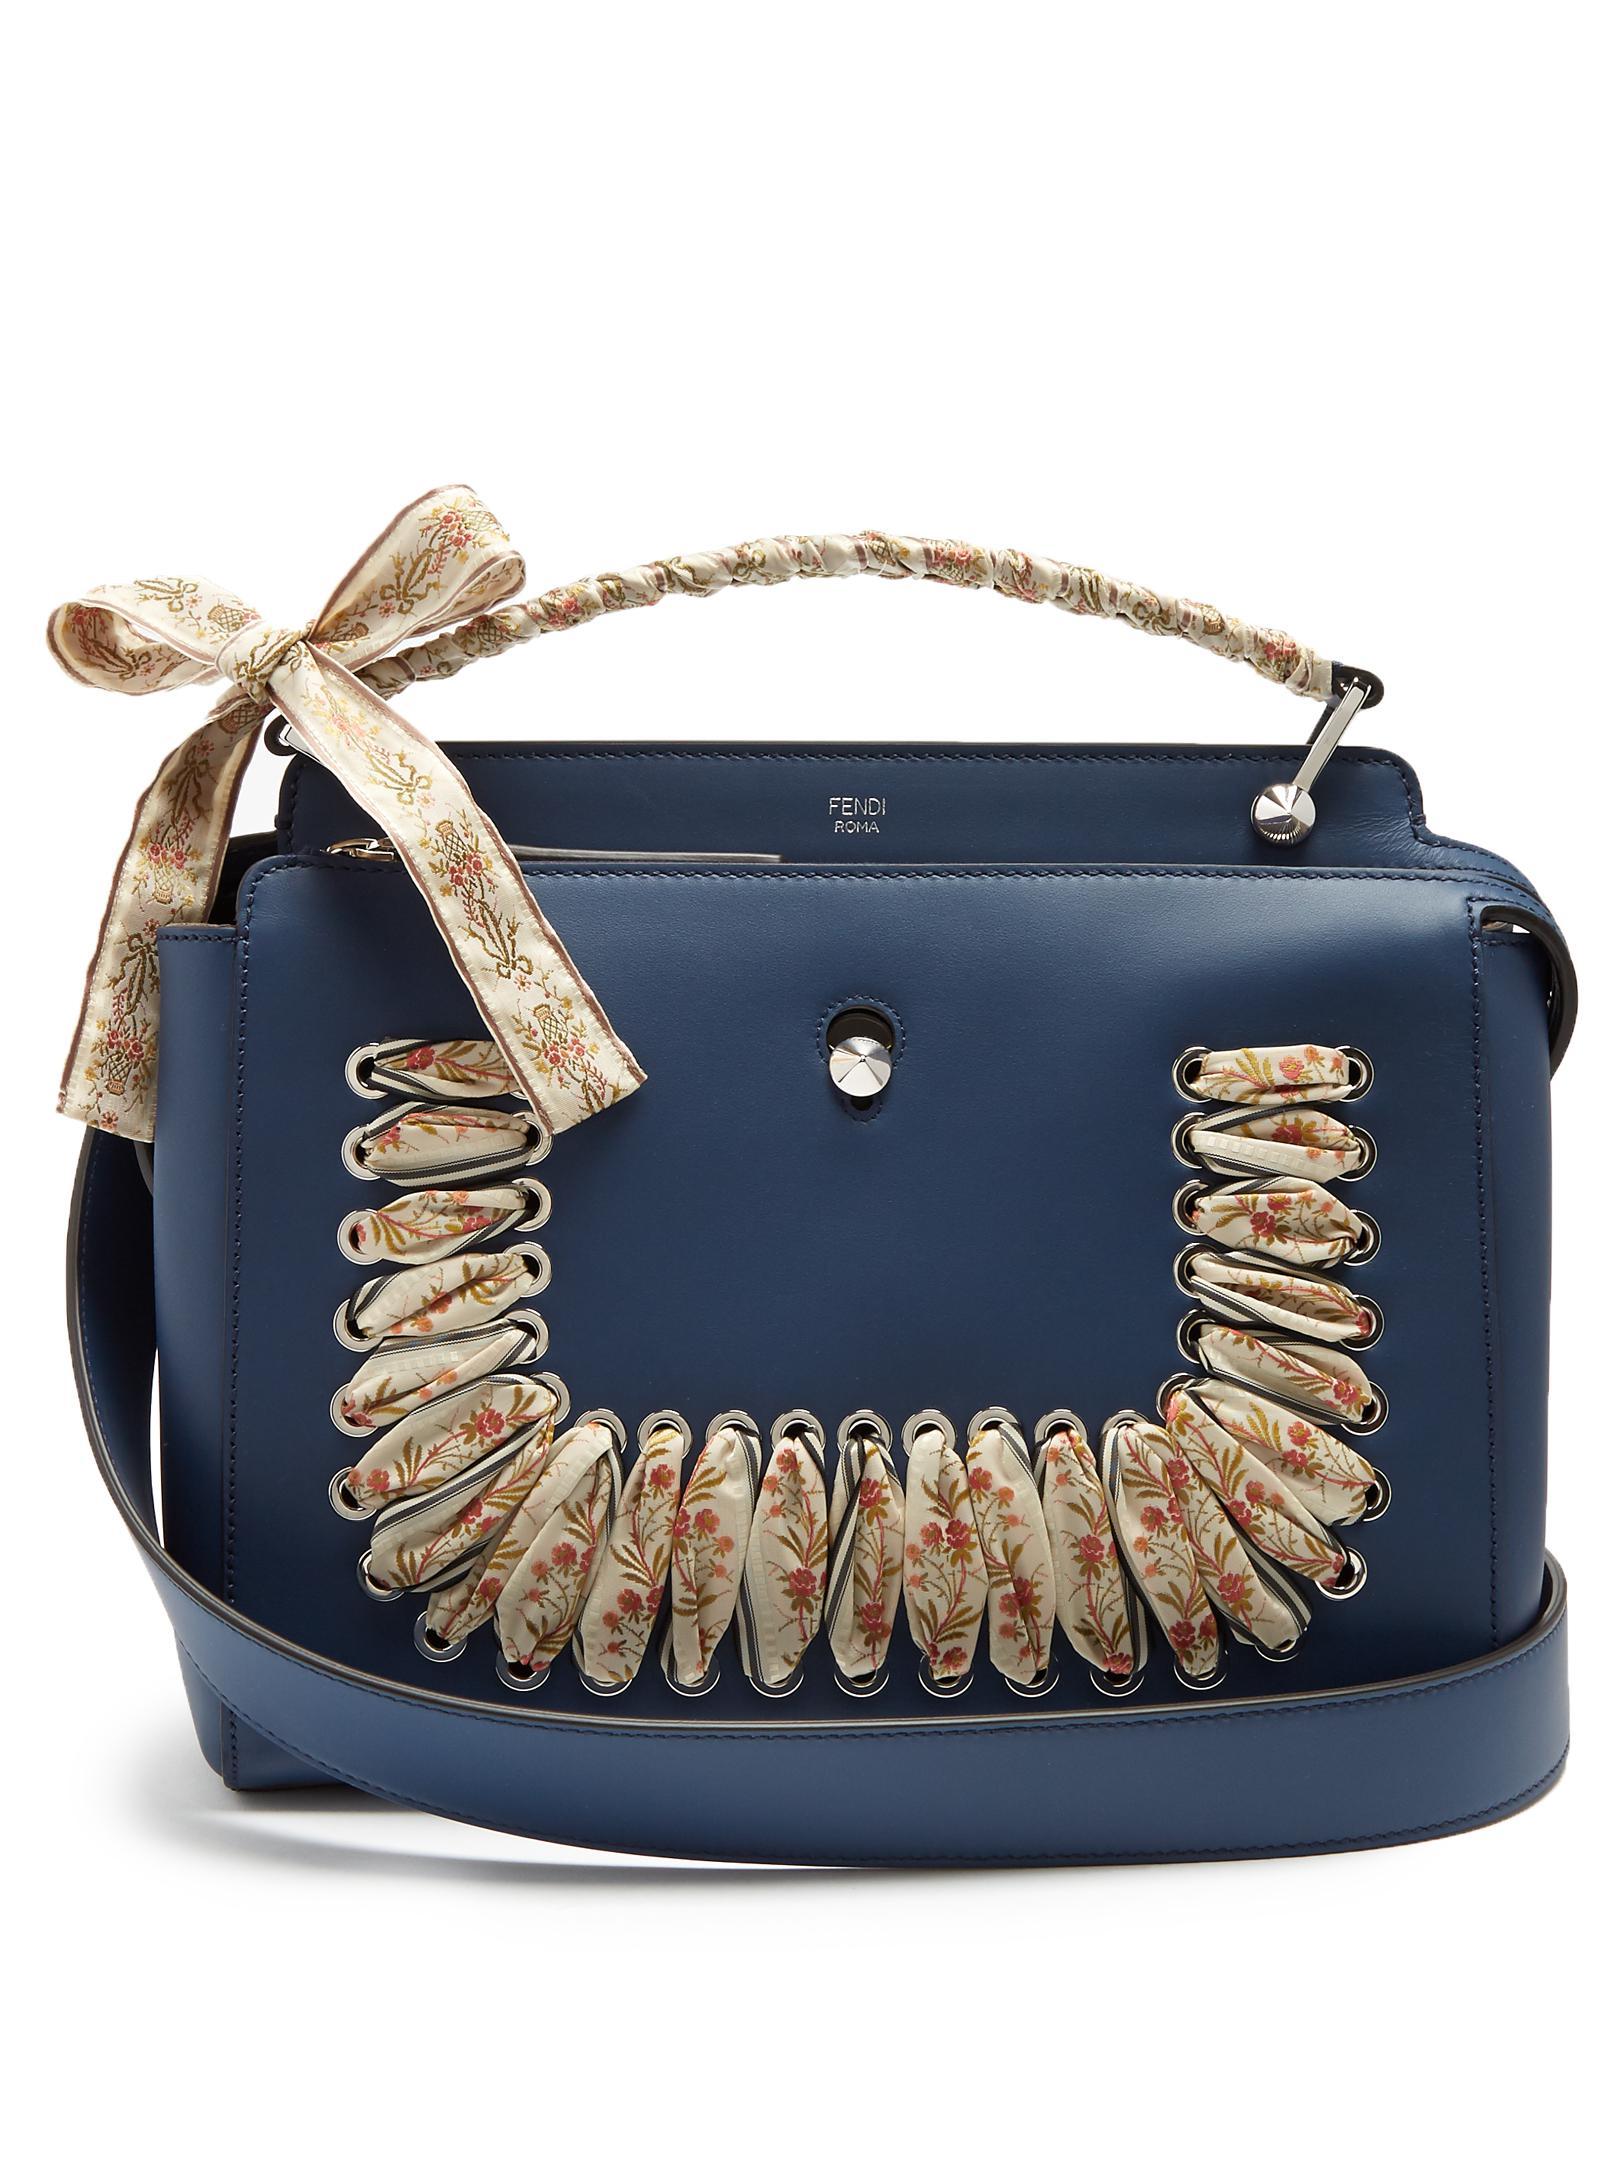 ... usa lyst fendi dotcom ribbon whipstitch leather bag in blue 13fa1 8b01f  ... 31d3edc547b5c